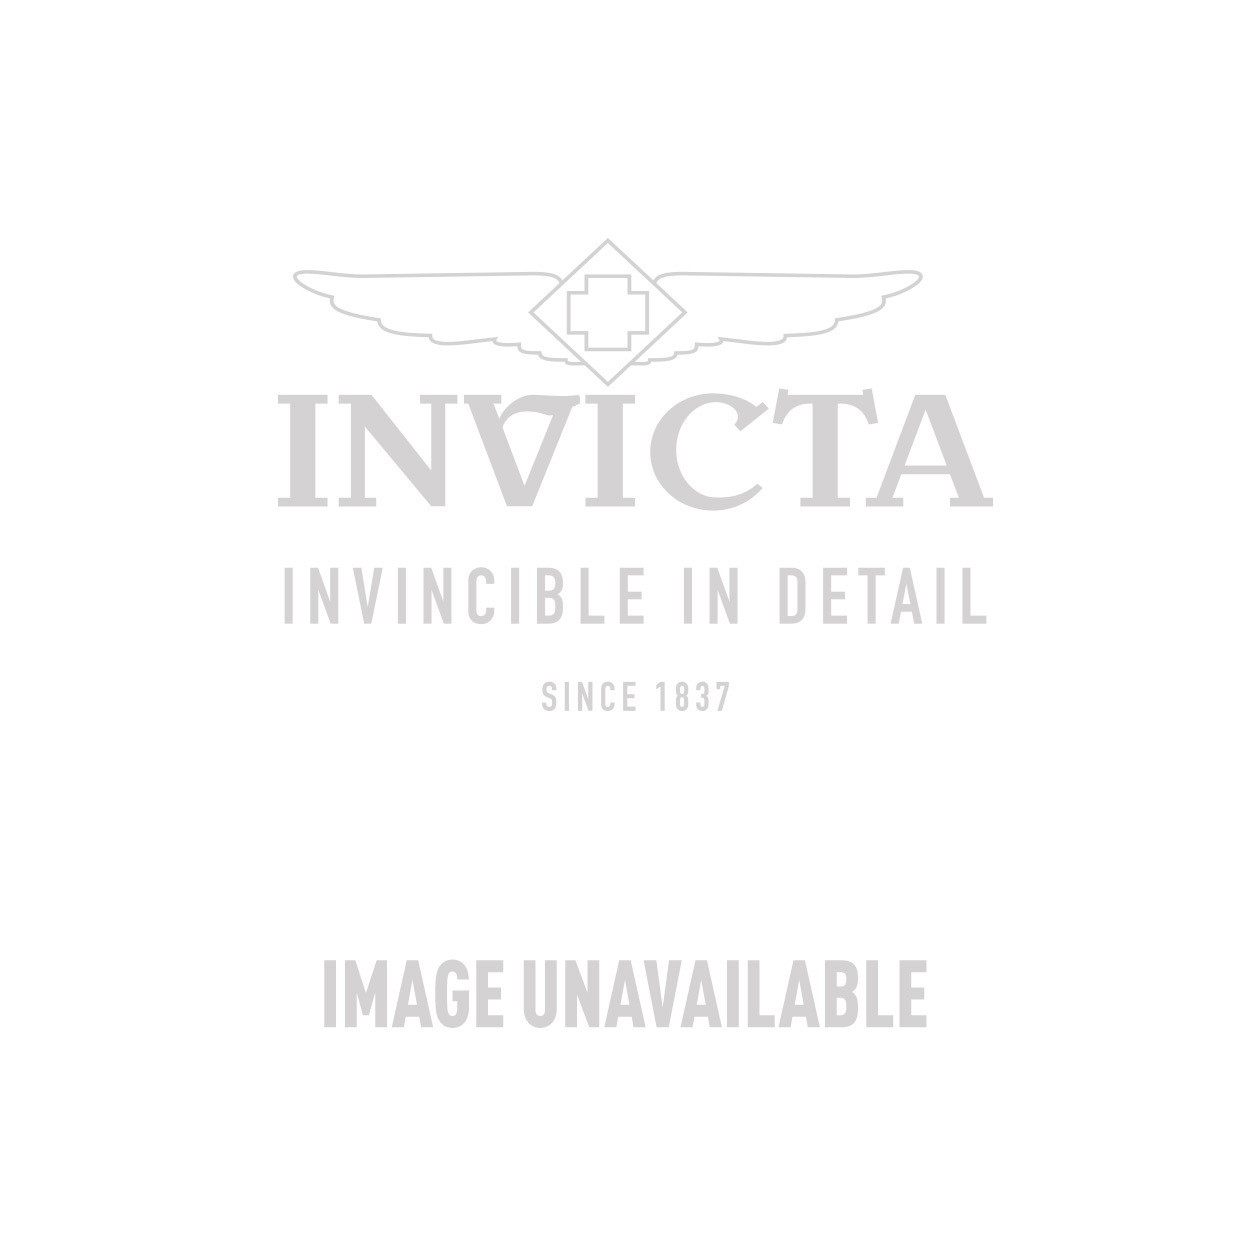 Invicta Subaqua Swiss Made Quartz Watch - Black case with Black, Red tone Silicone band - Model 0877